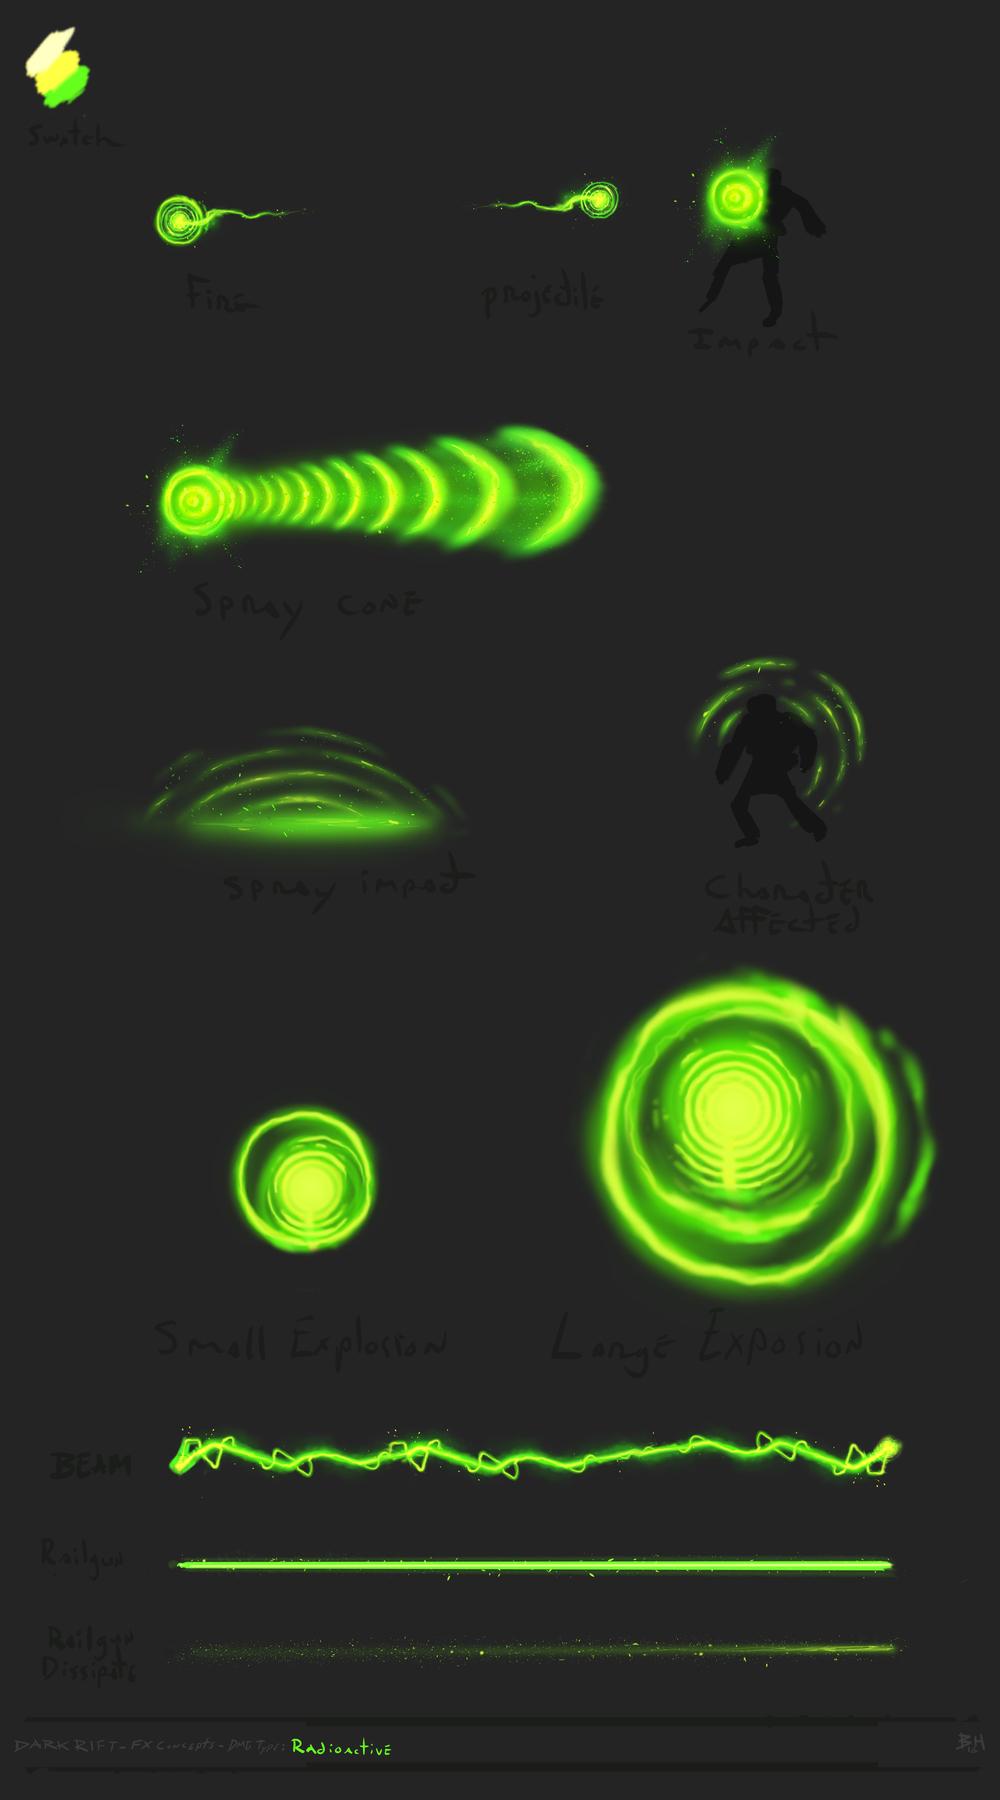 [wip]FX_Concepts-Radioactive.jpg